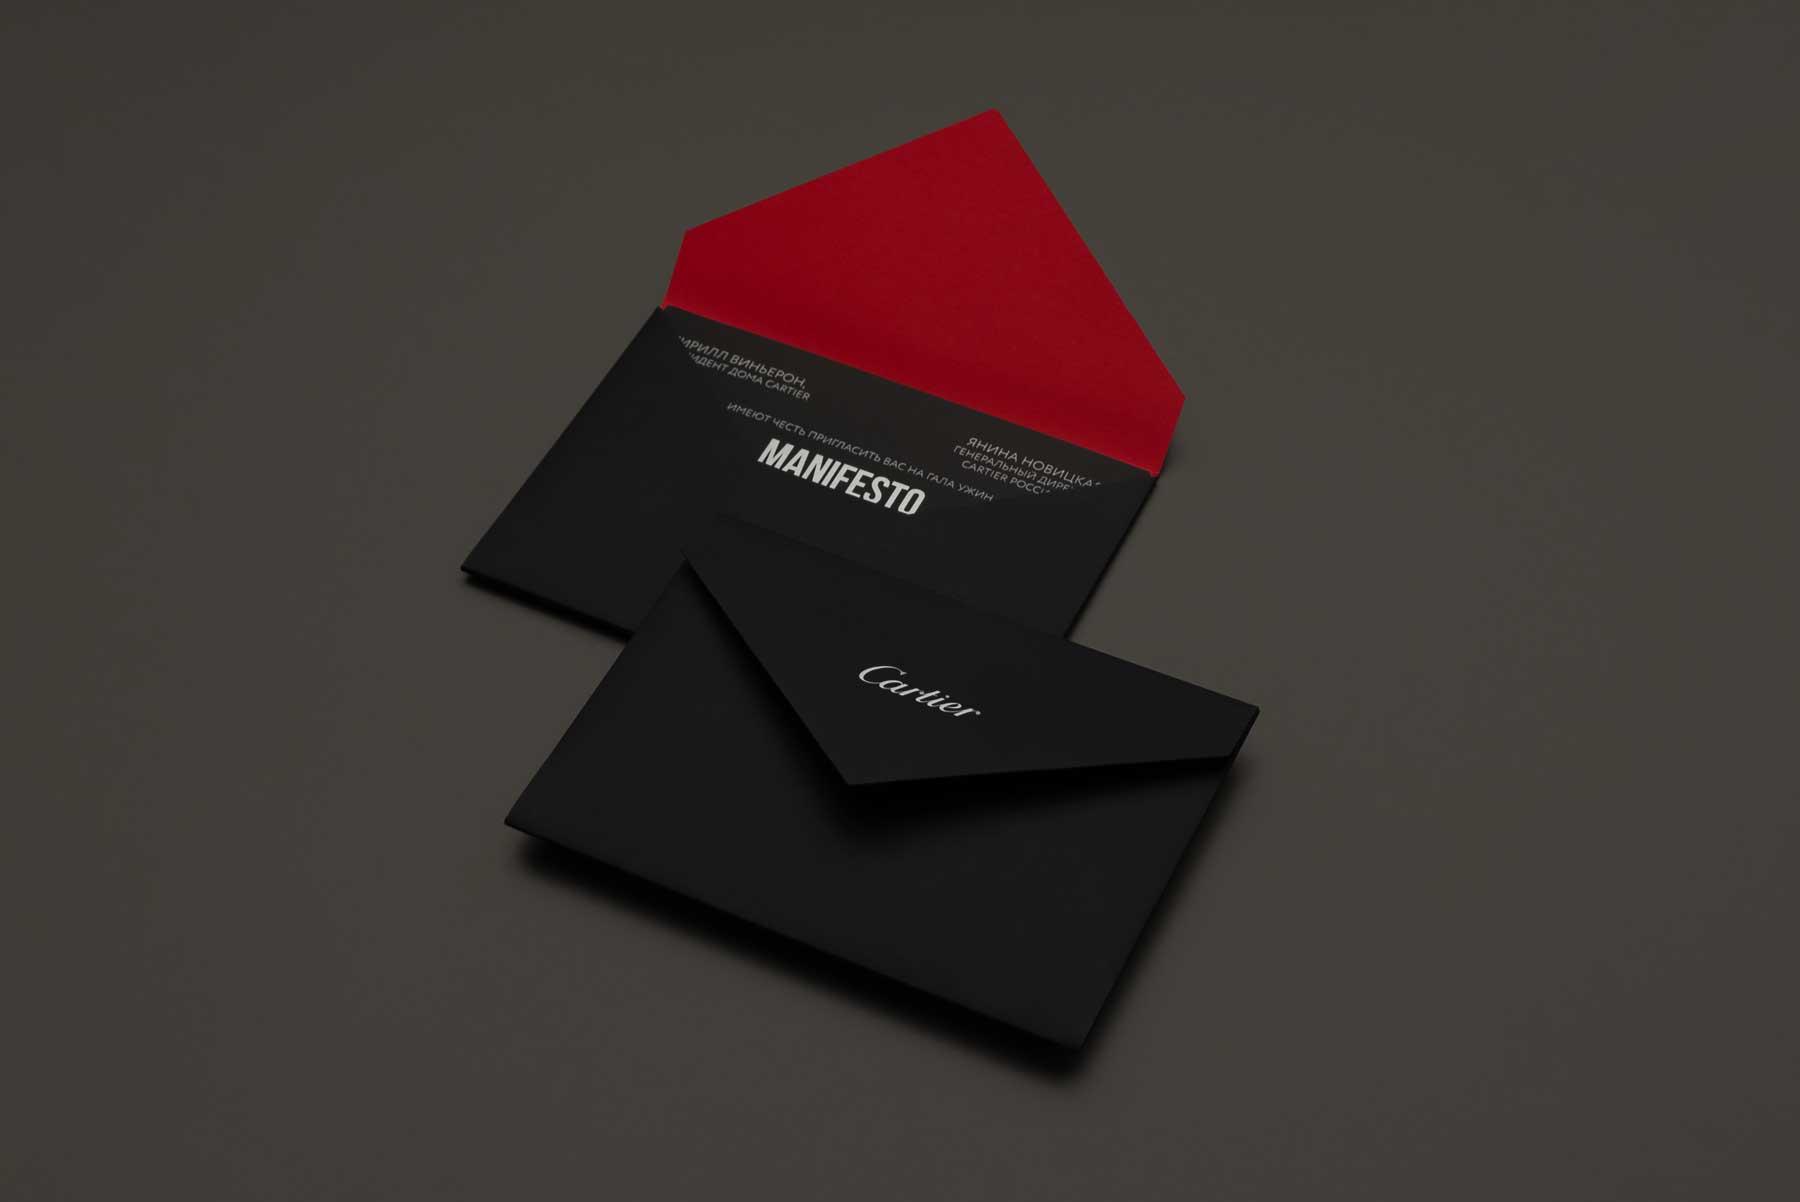 Manifesto Cartier